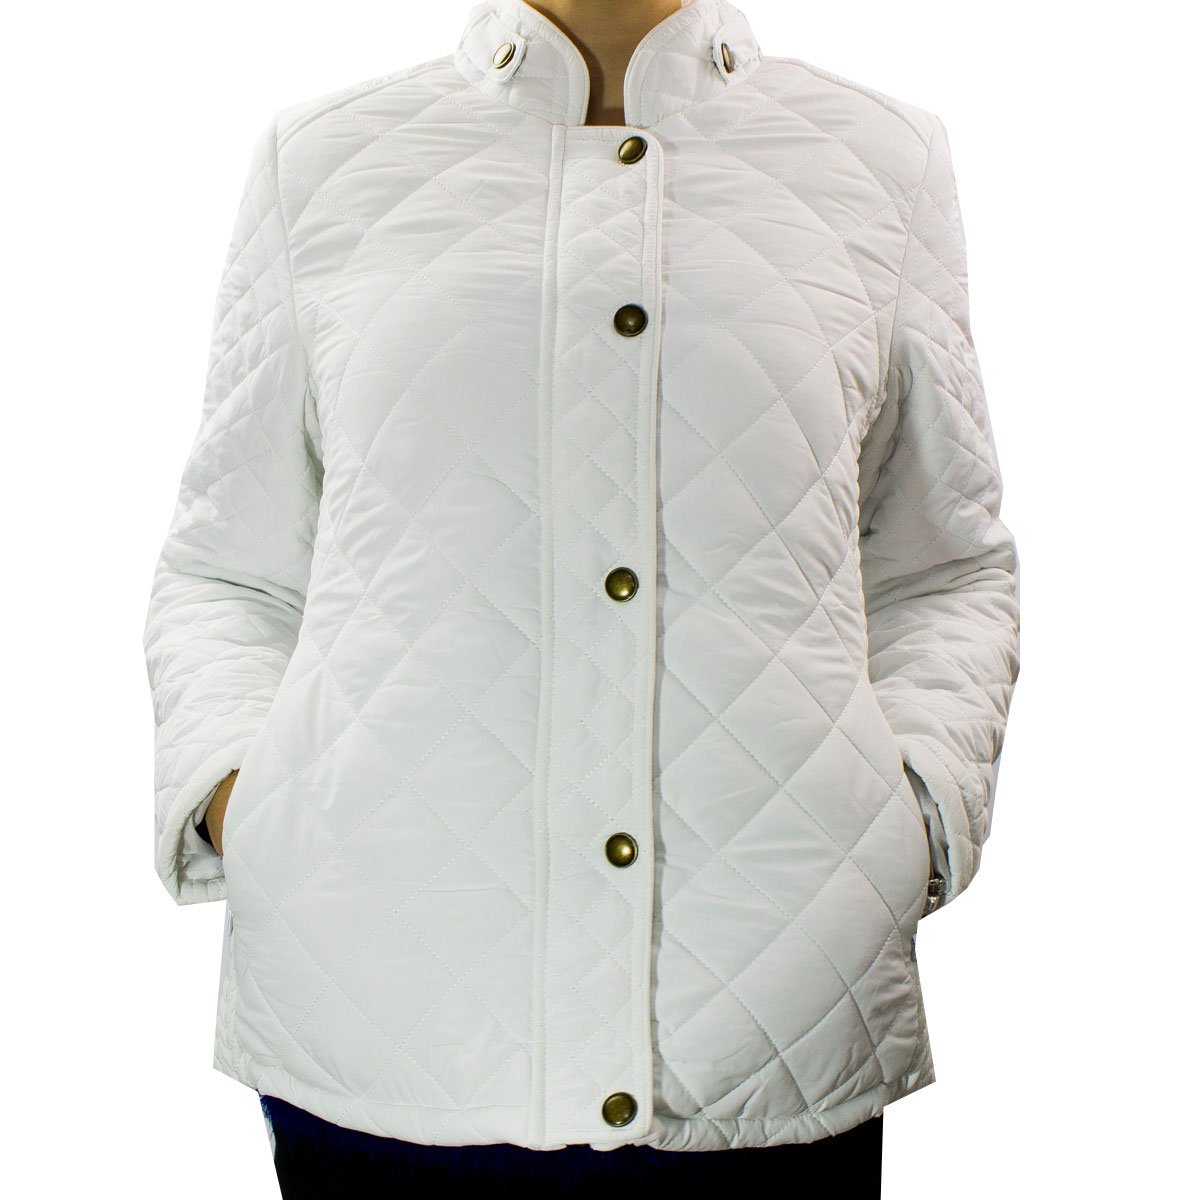 Bizz Store - Casaco Com Pelo Feminino Mosaico VIP Branco 516ae7bdb81c9